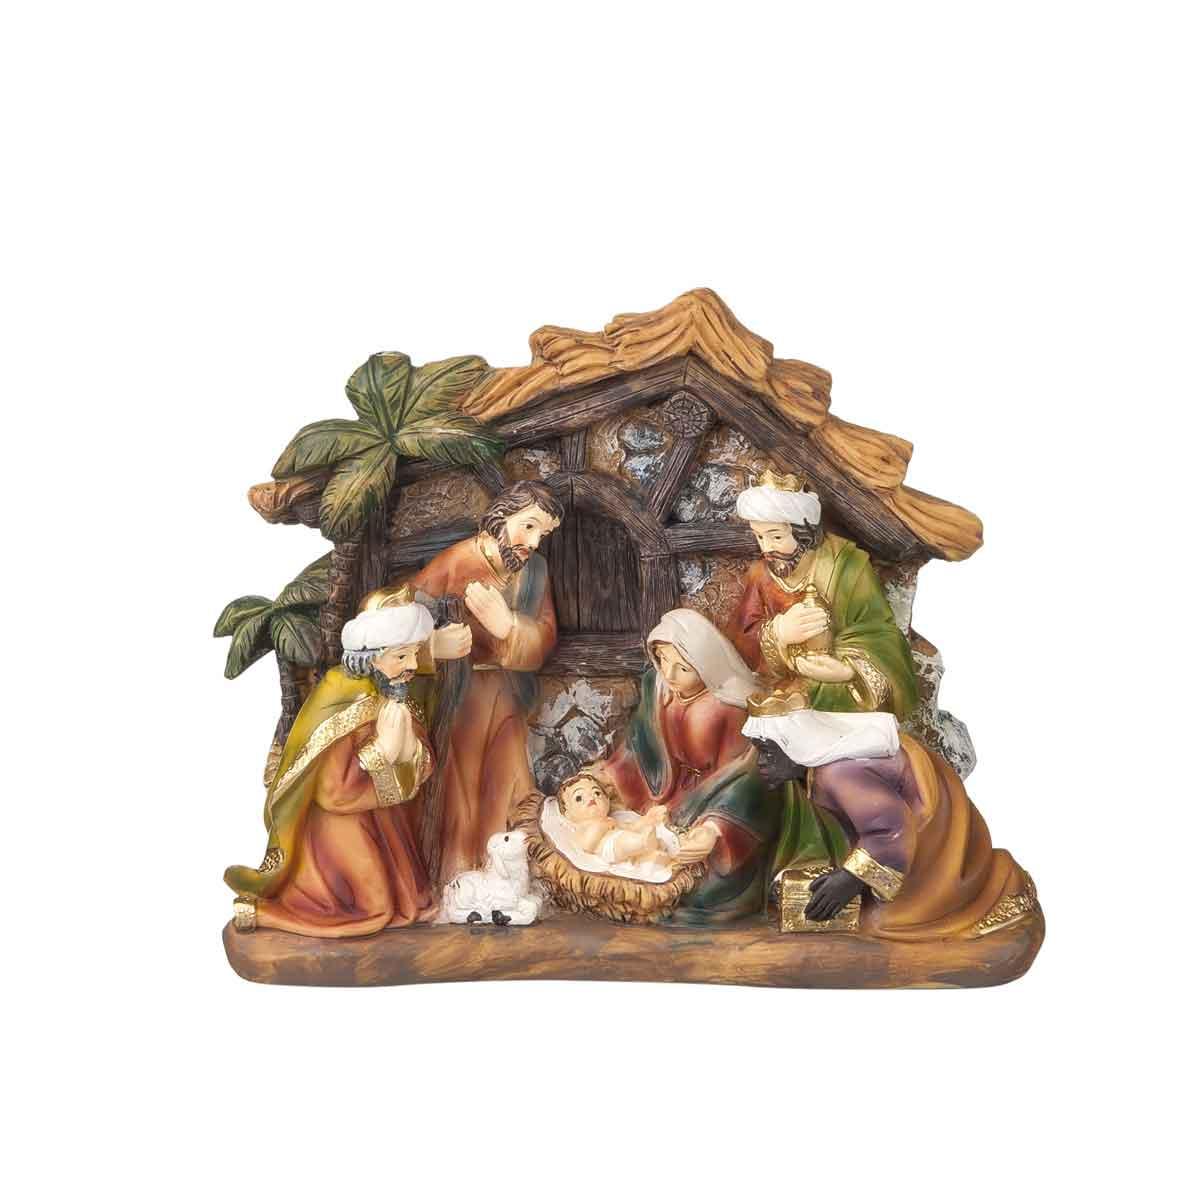 "Presepe – Natività completa in resina ""capanna"" altezza 13 cm"